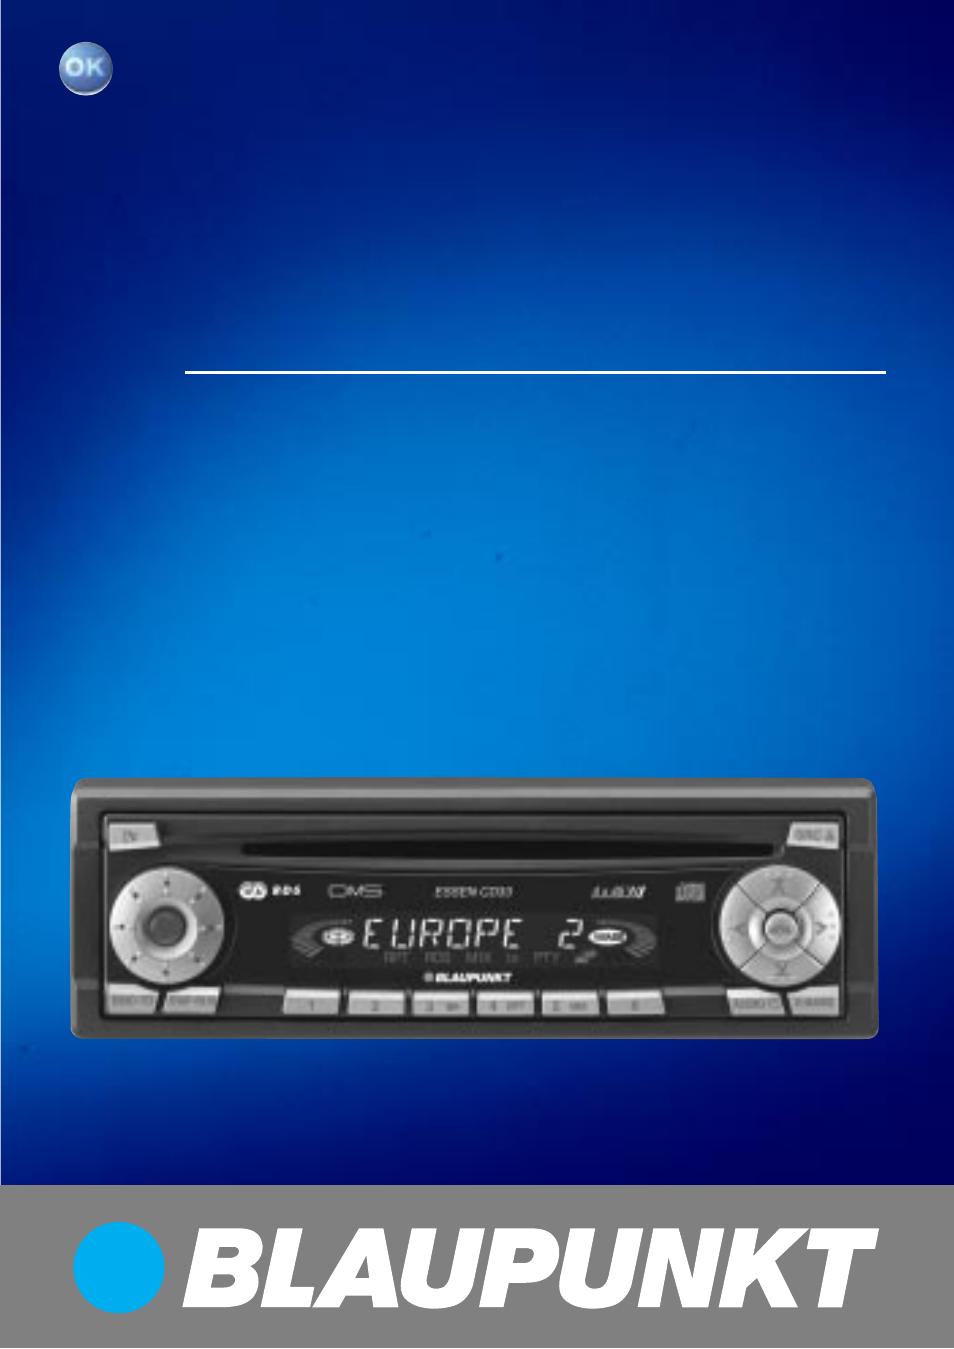 blaupunkt cd33 user manual 25 pages rh manualsdir com stereo blaupunkt laguna cd36 manual blaupunkt 520 car stereo manual